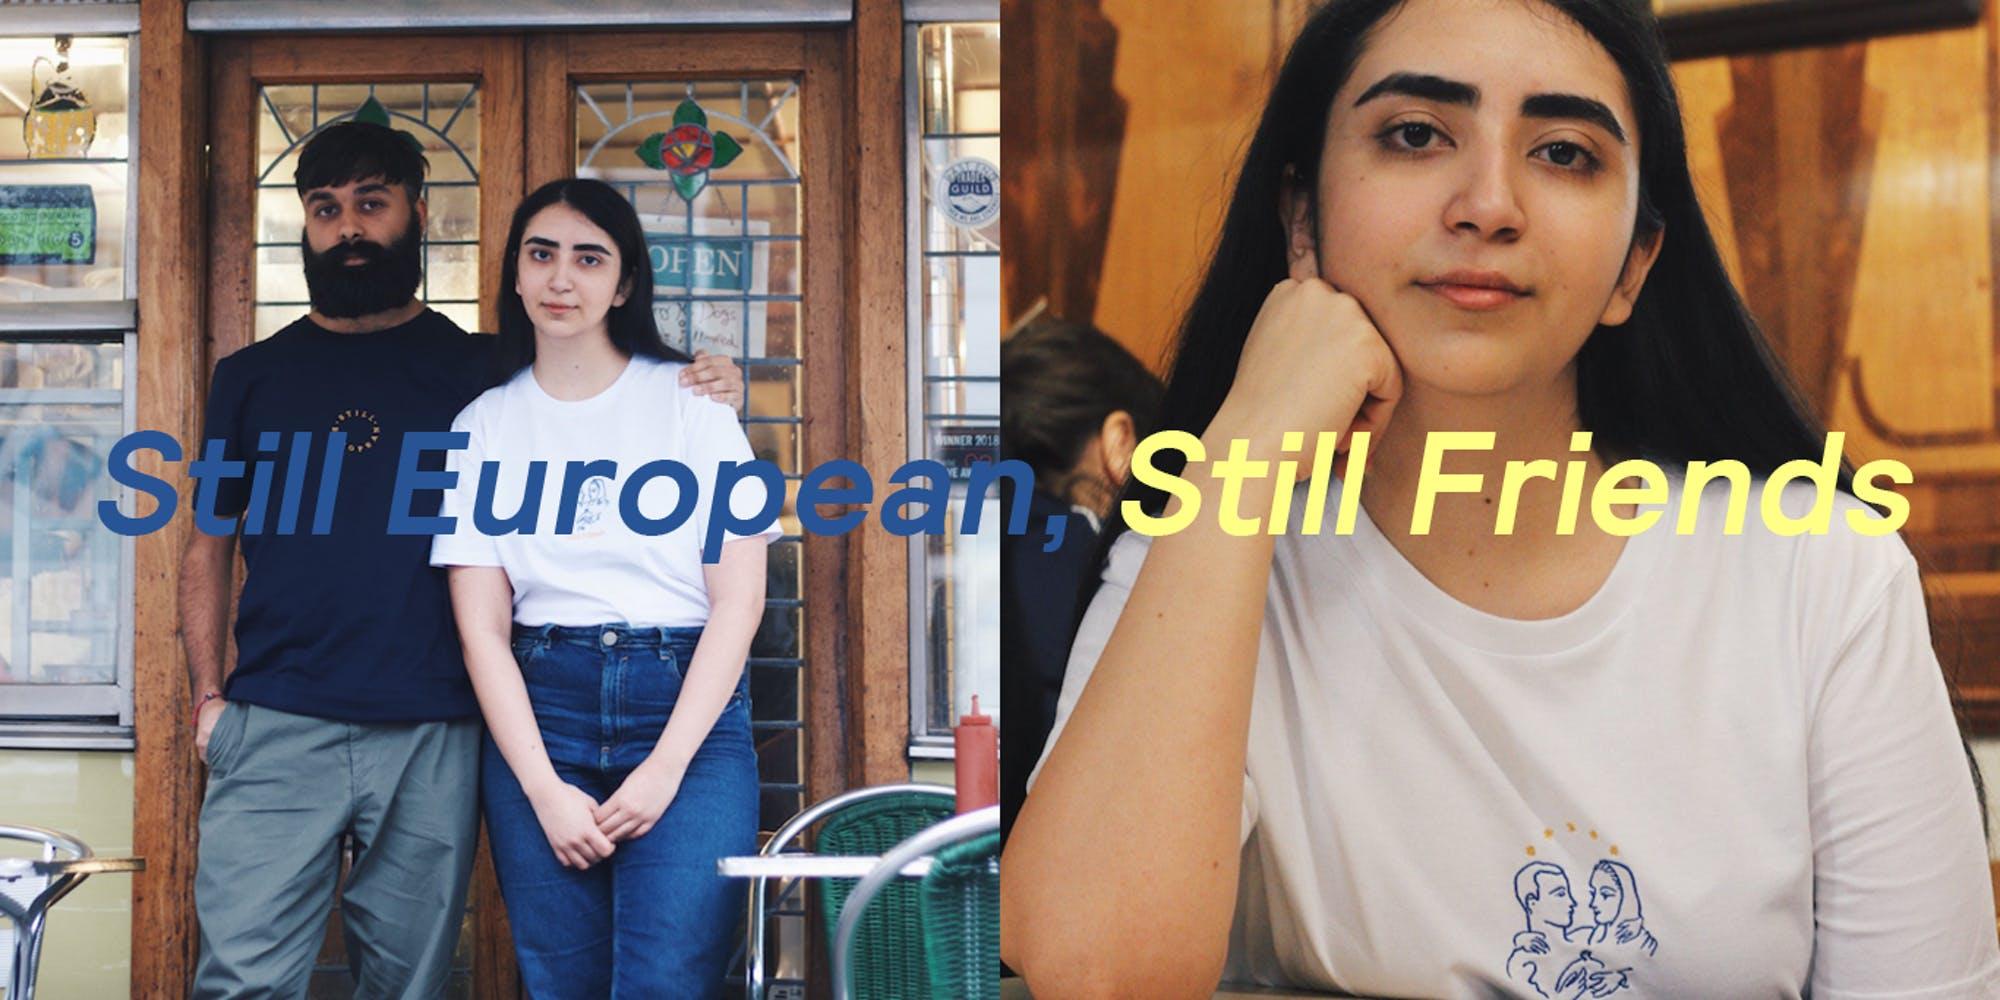 ae201a76da1 Still European, Still Friends: Reaffirming Community During Brexit £10 – £15